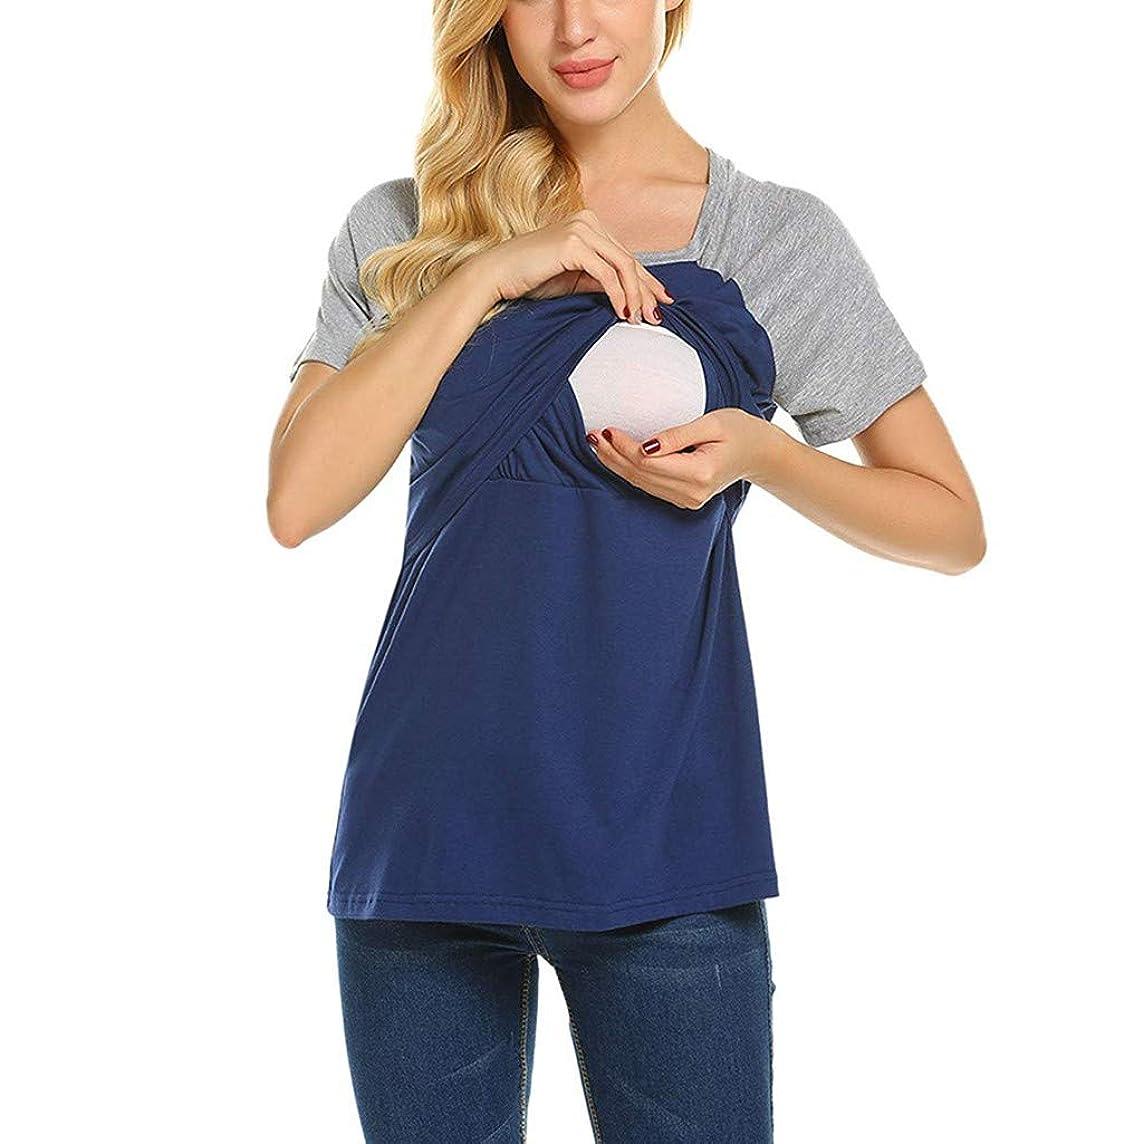 Women's Maternity Tops Nursing Breastfeeding T-Shirt Maternity T Shirts Top